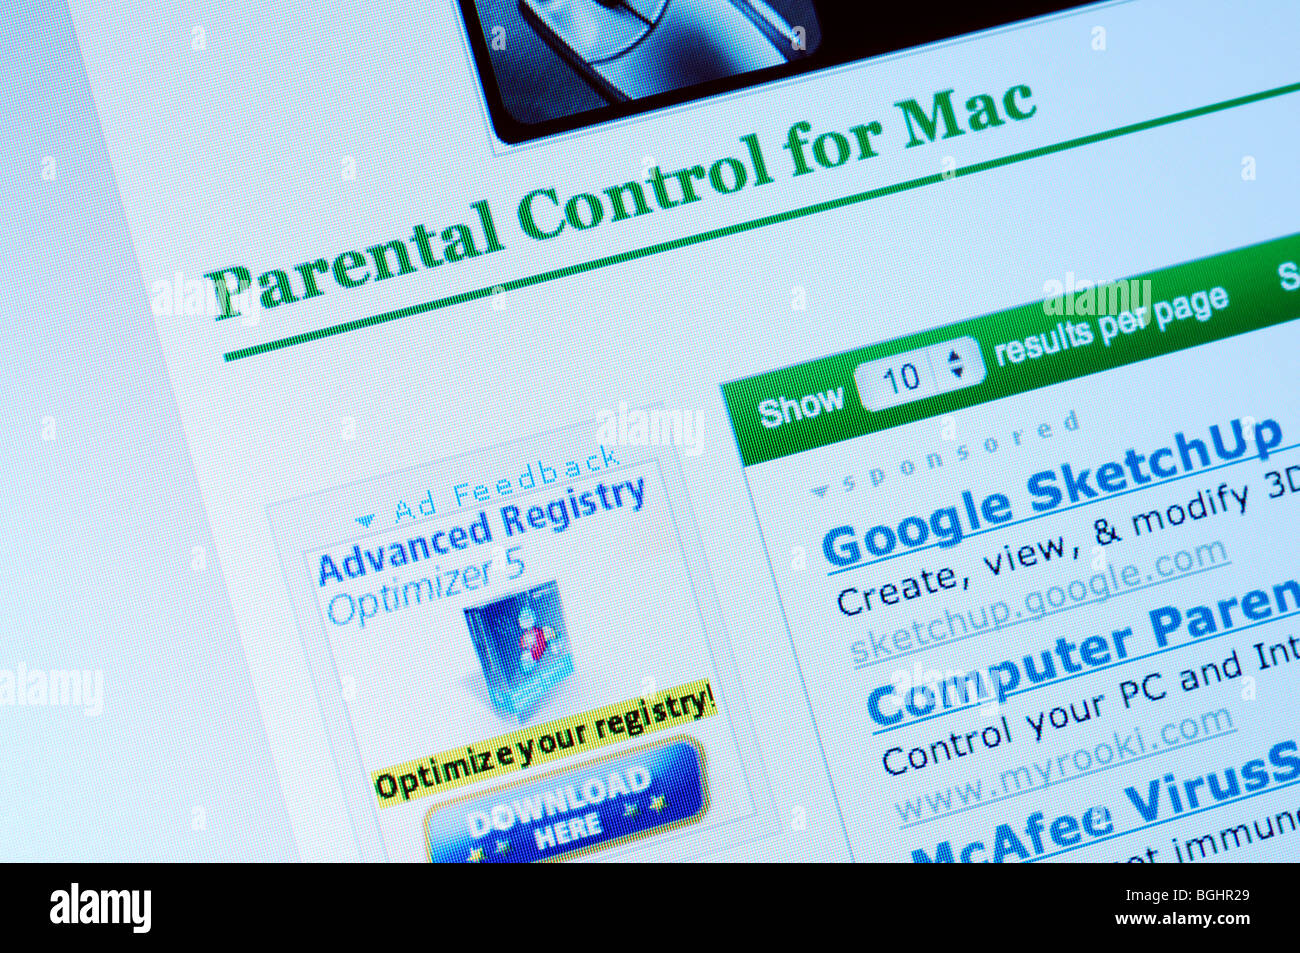 Parental Control for Mac (website) - Stock Image